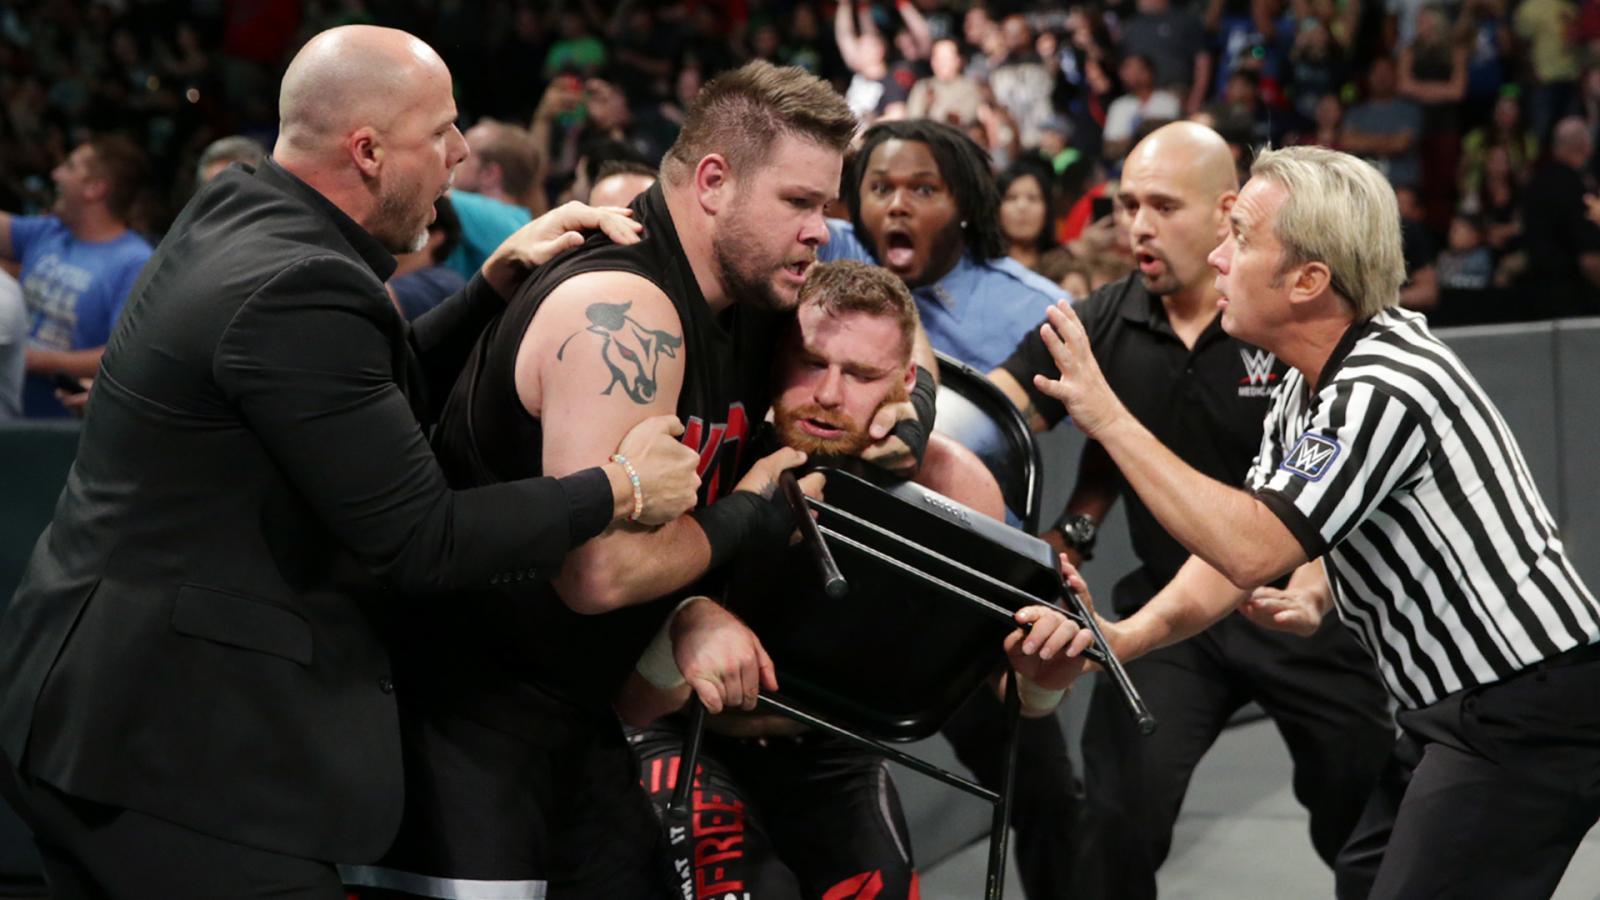 SmackDown Live Moments Glendale